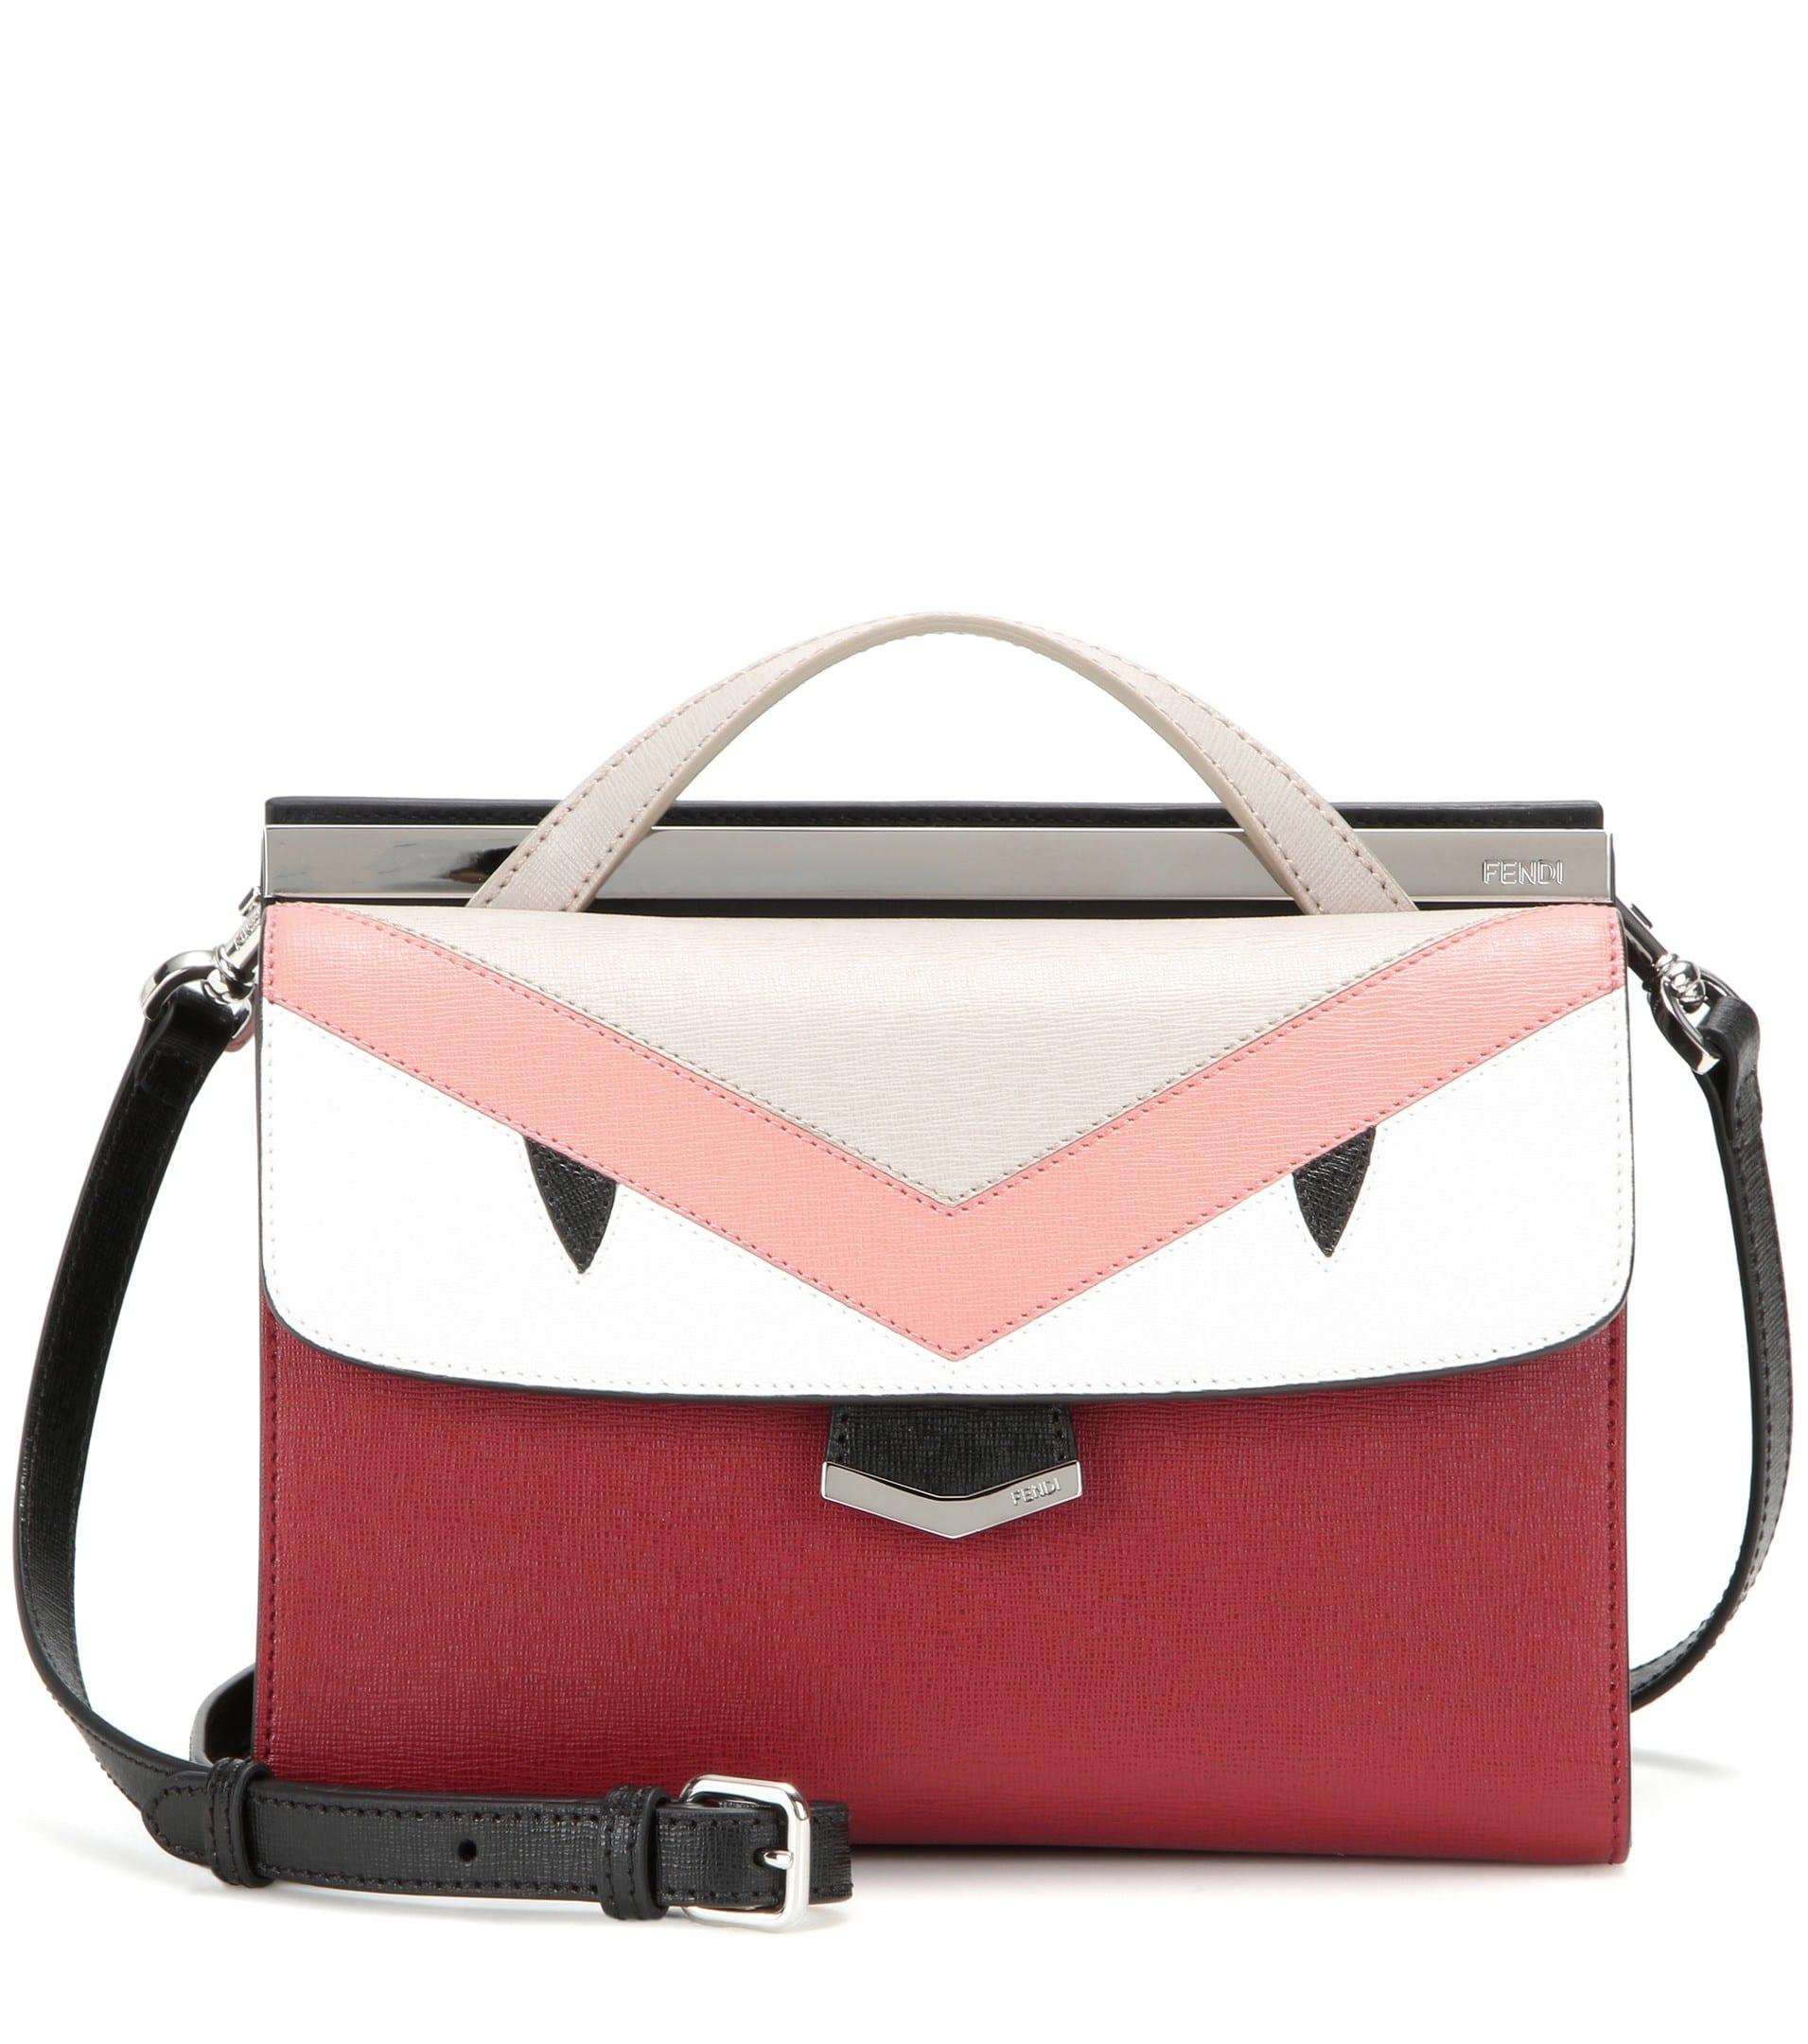 Fendi Monster Bag Pink